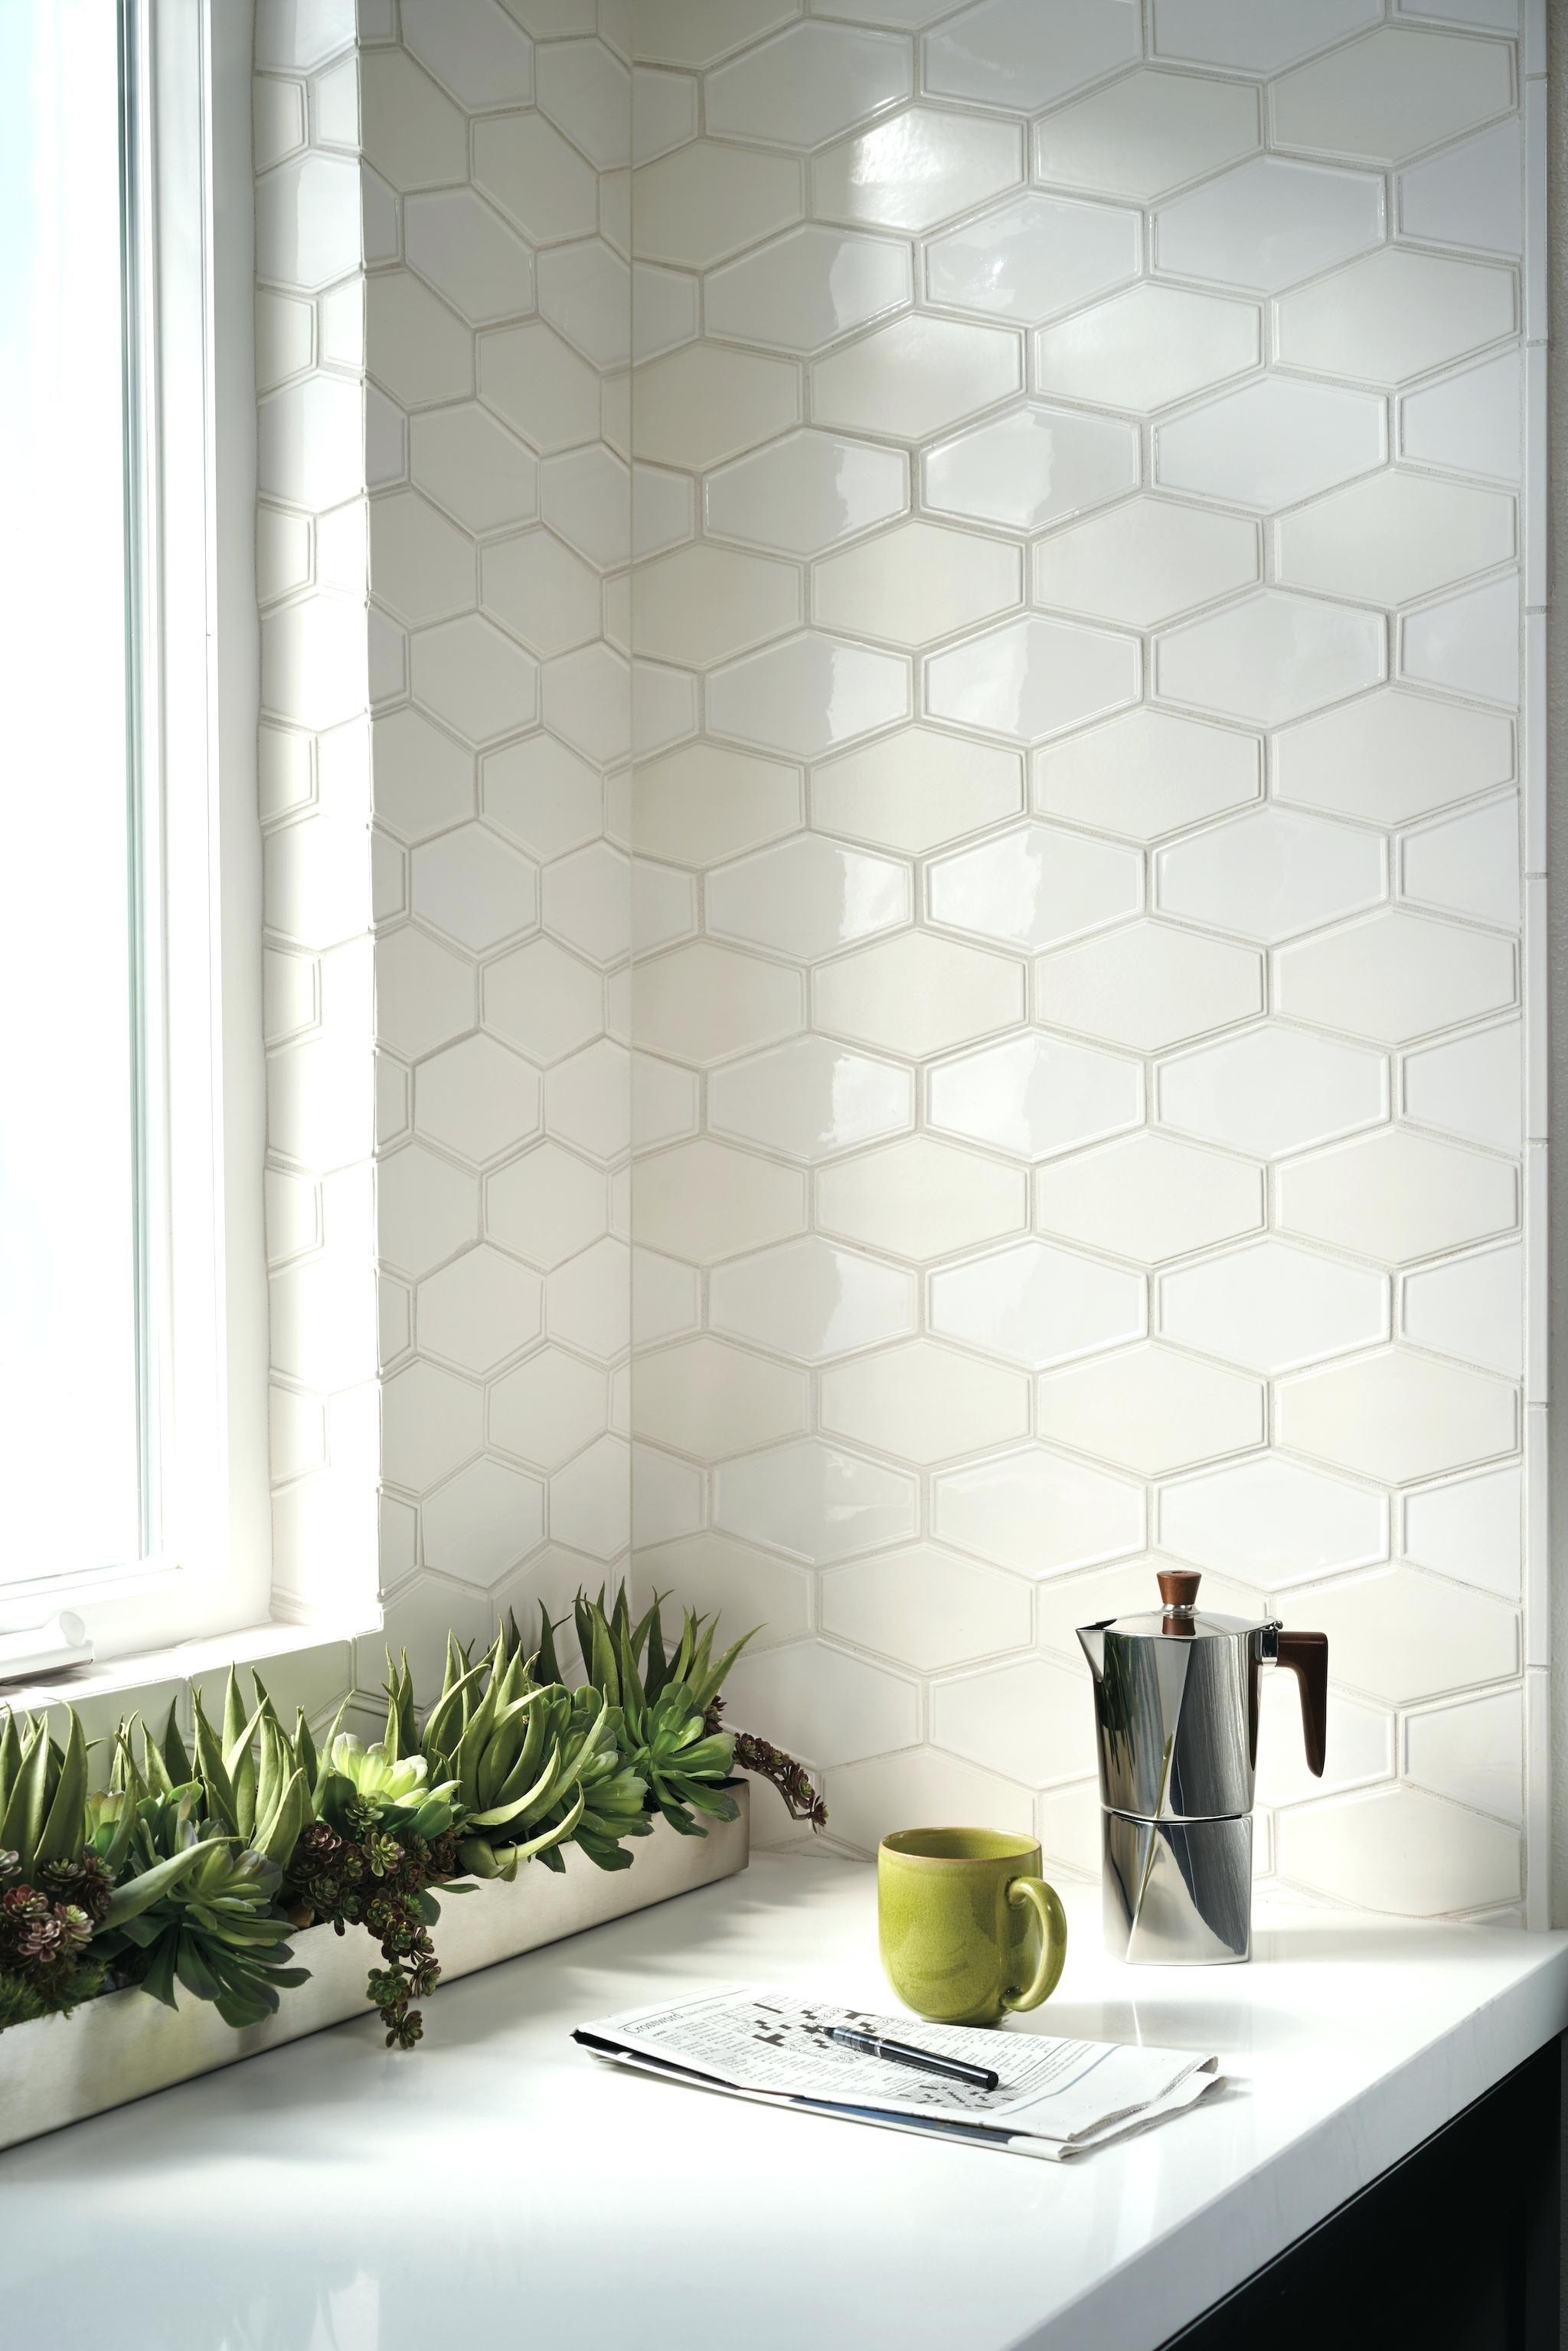 Hexagonal Tile Backsplash Frame By Made By Sacks Ceramic Tile Frame By Made By Sacks C Ann Sacks Kitchen Backsplash Kitchen Tiles Backsplash Kitchen Backsplash